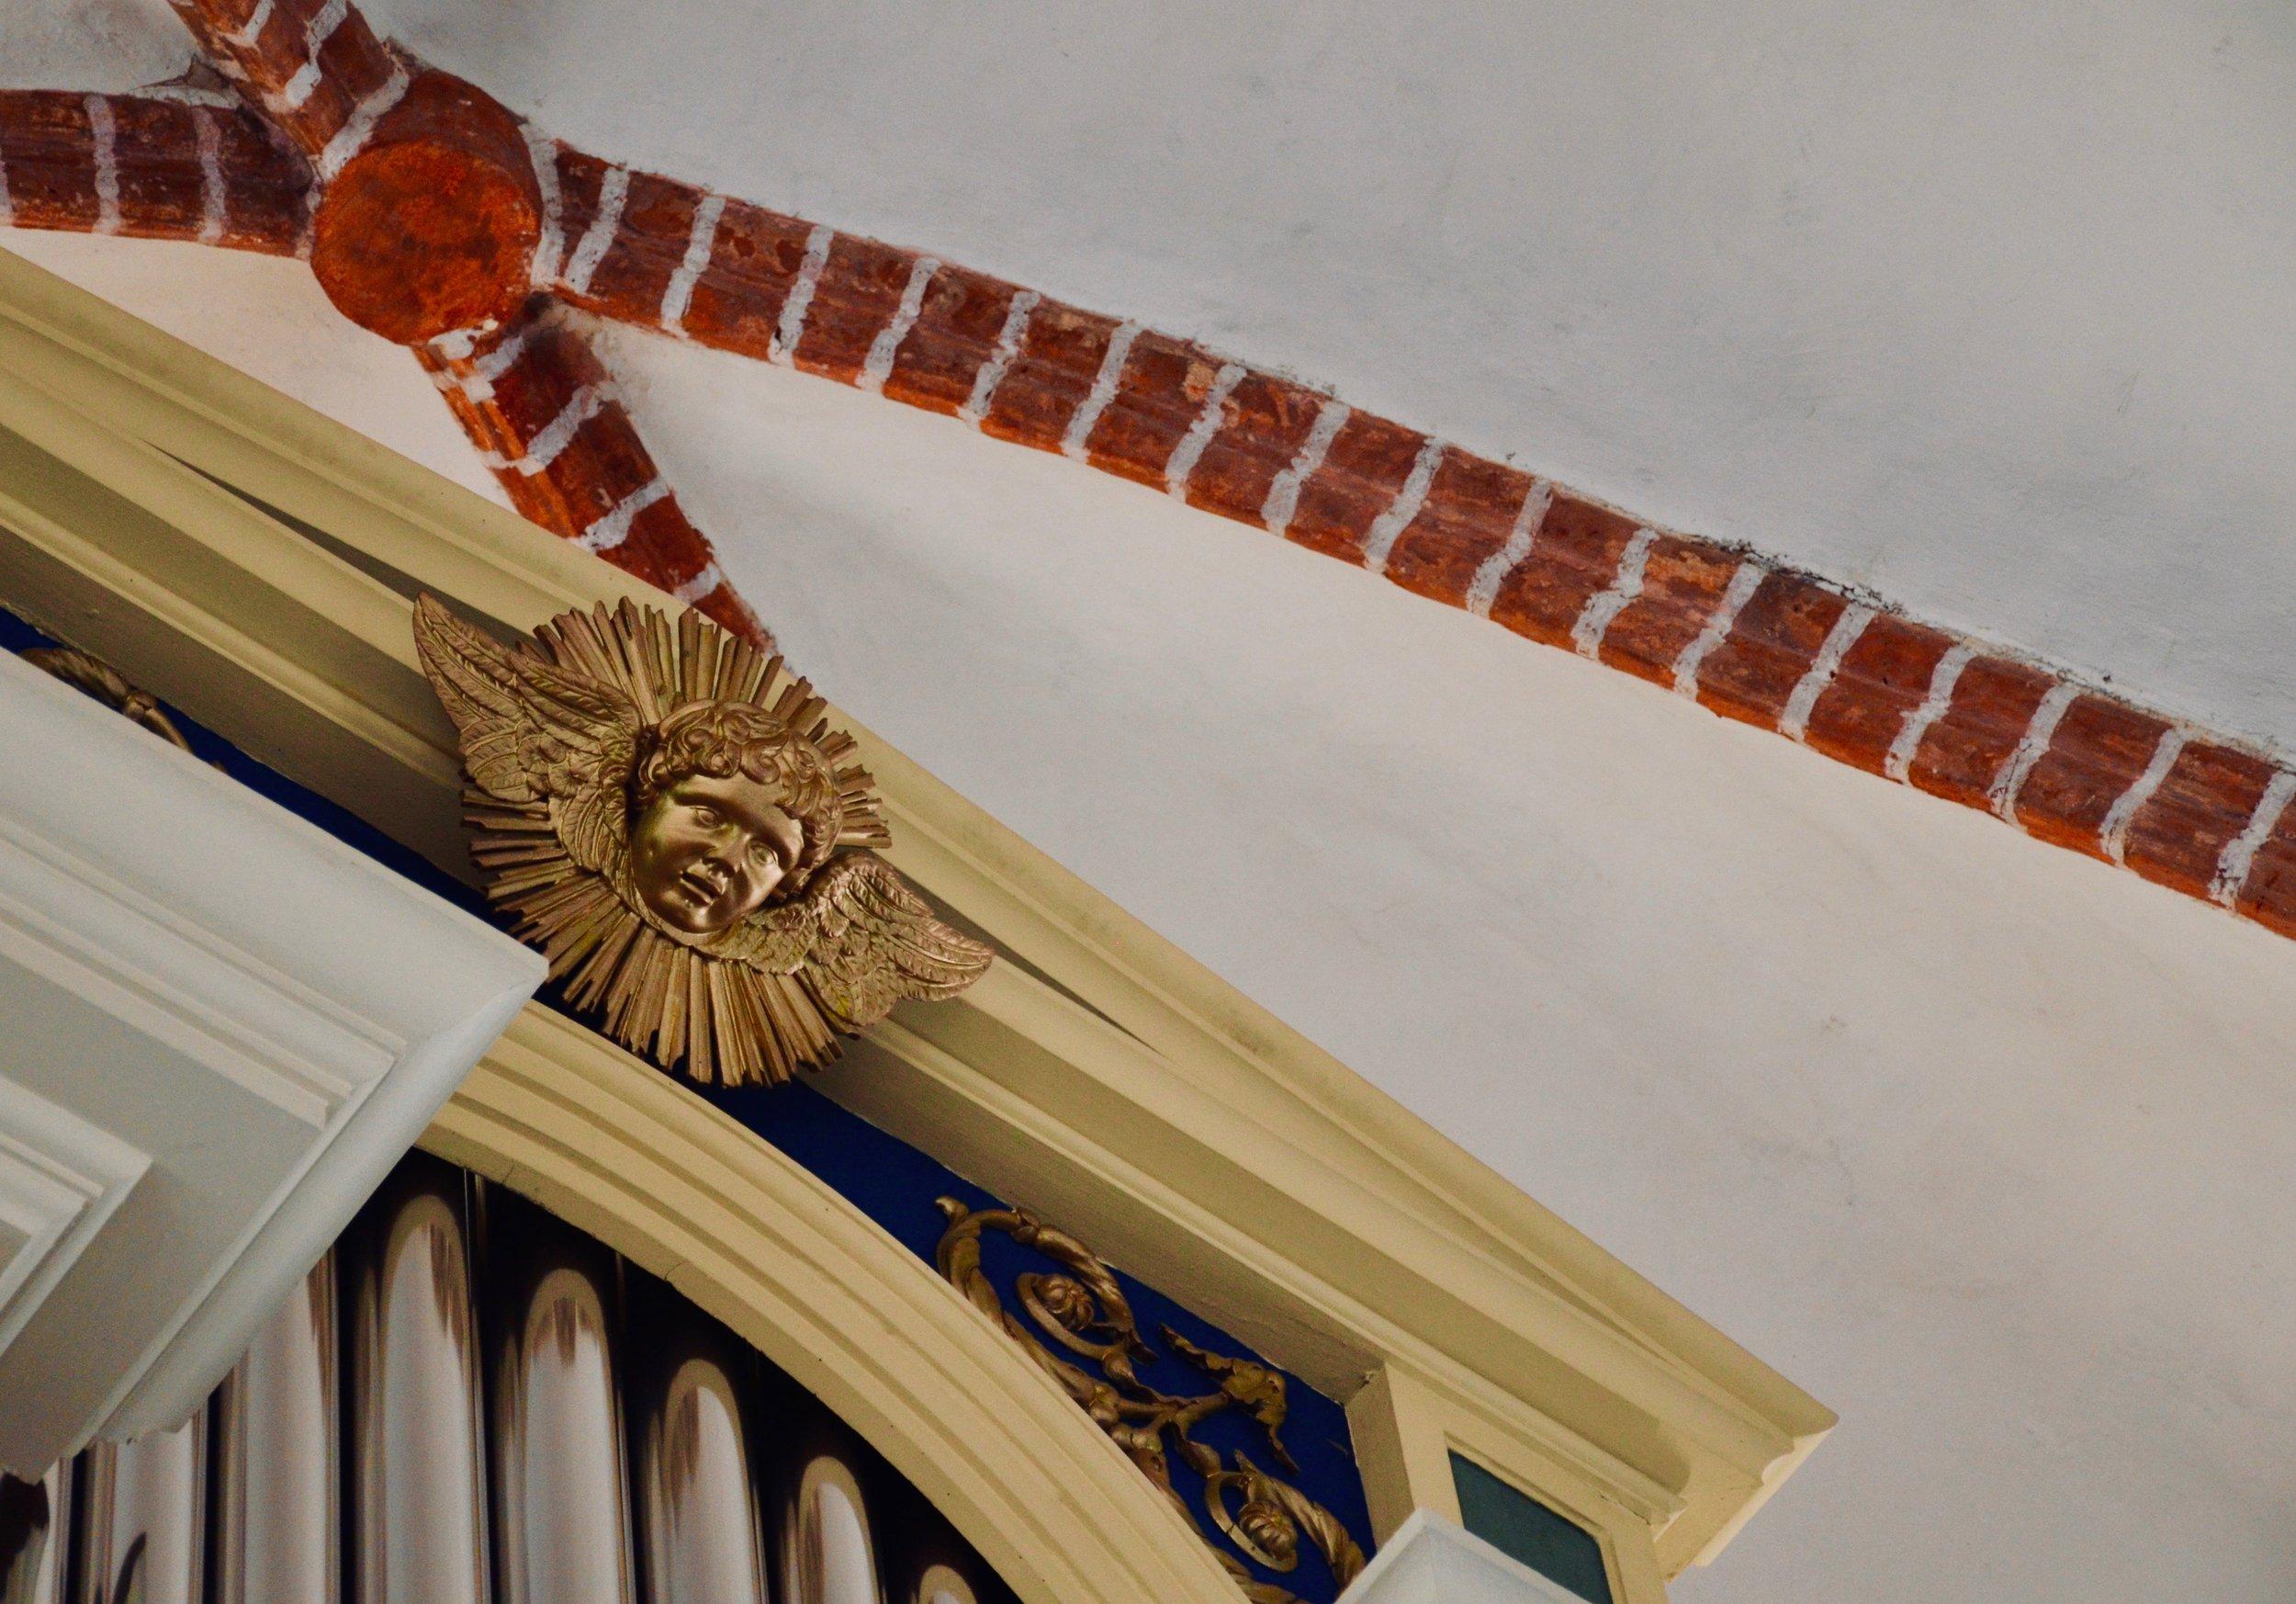 Case detail, 1825 Buchholz Organ in St. Nicolai-kirche, Osterburg.